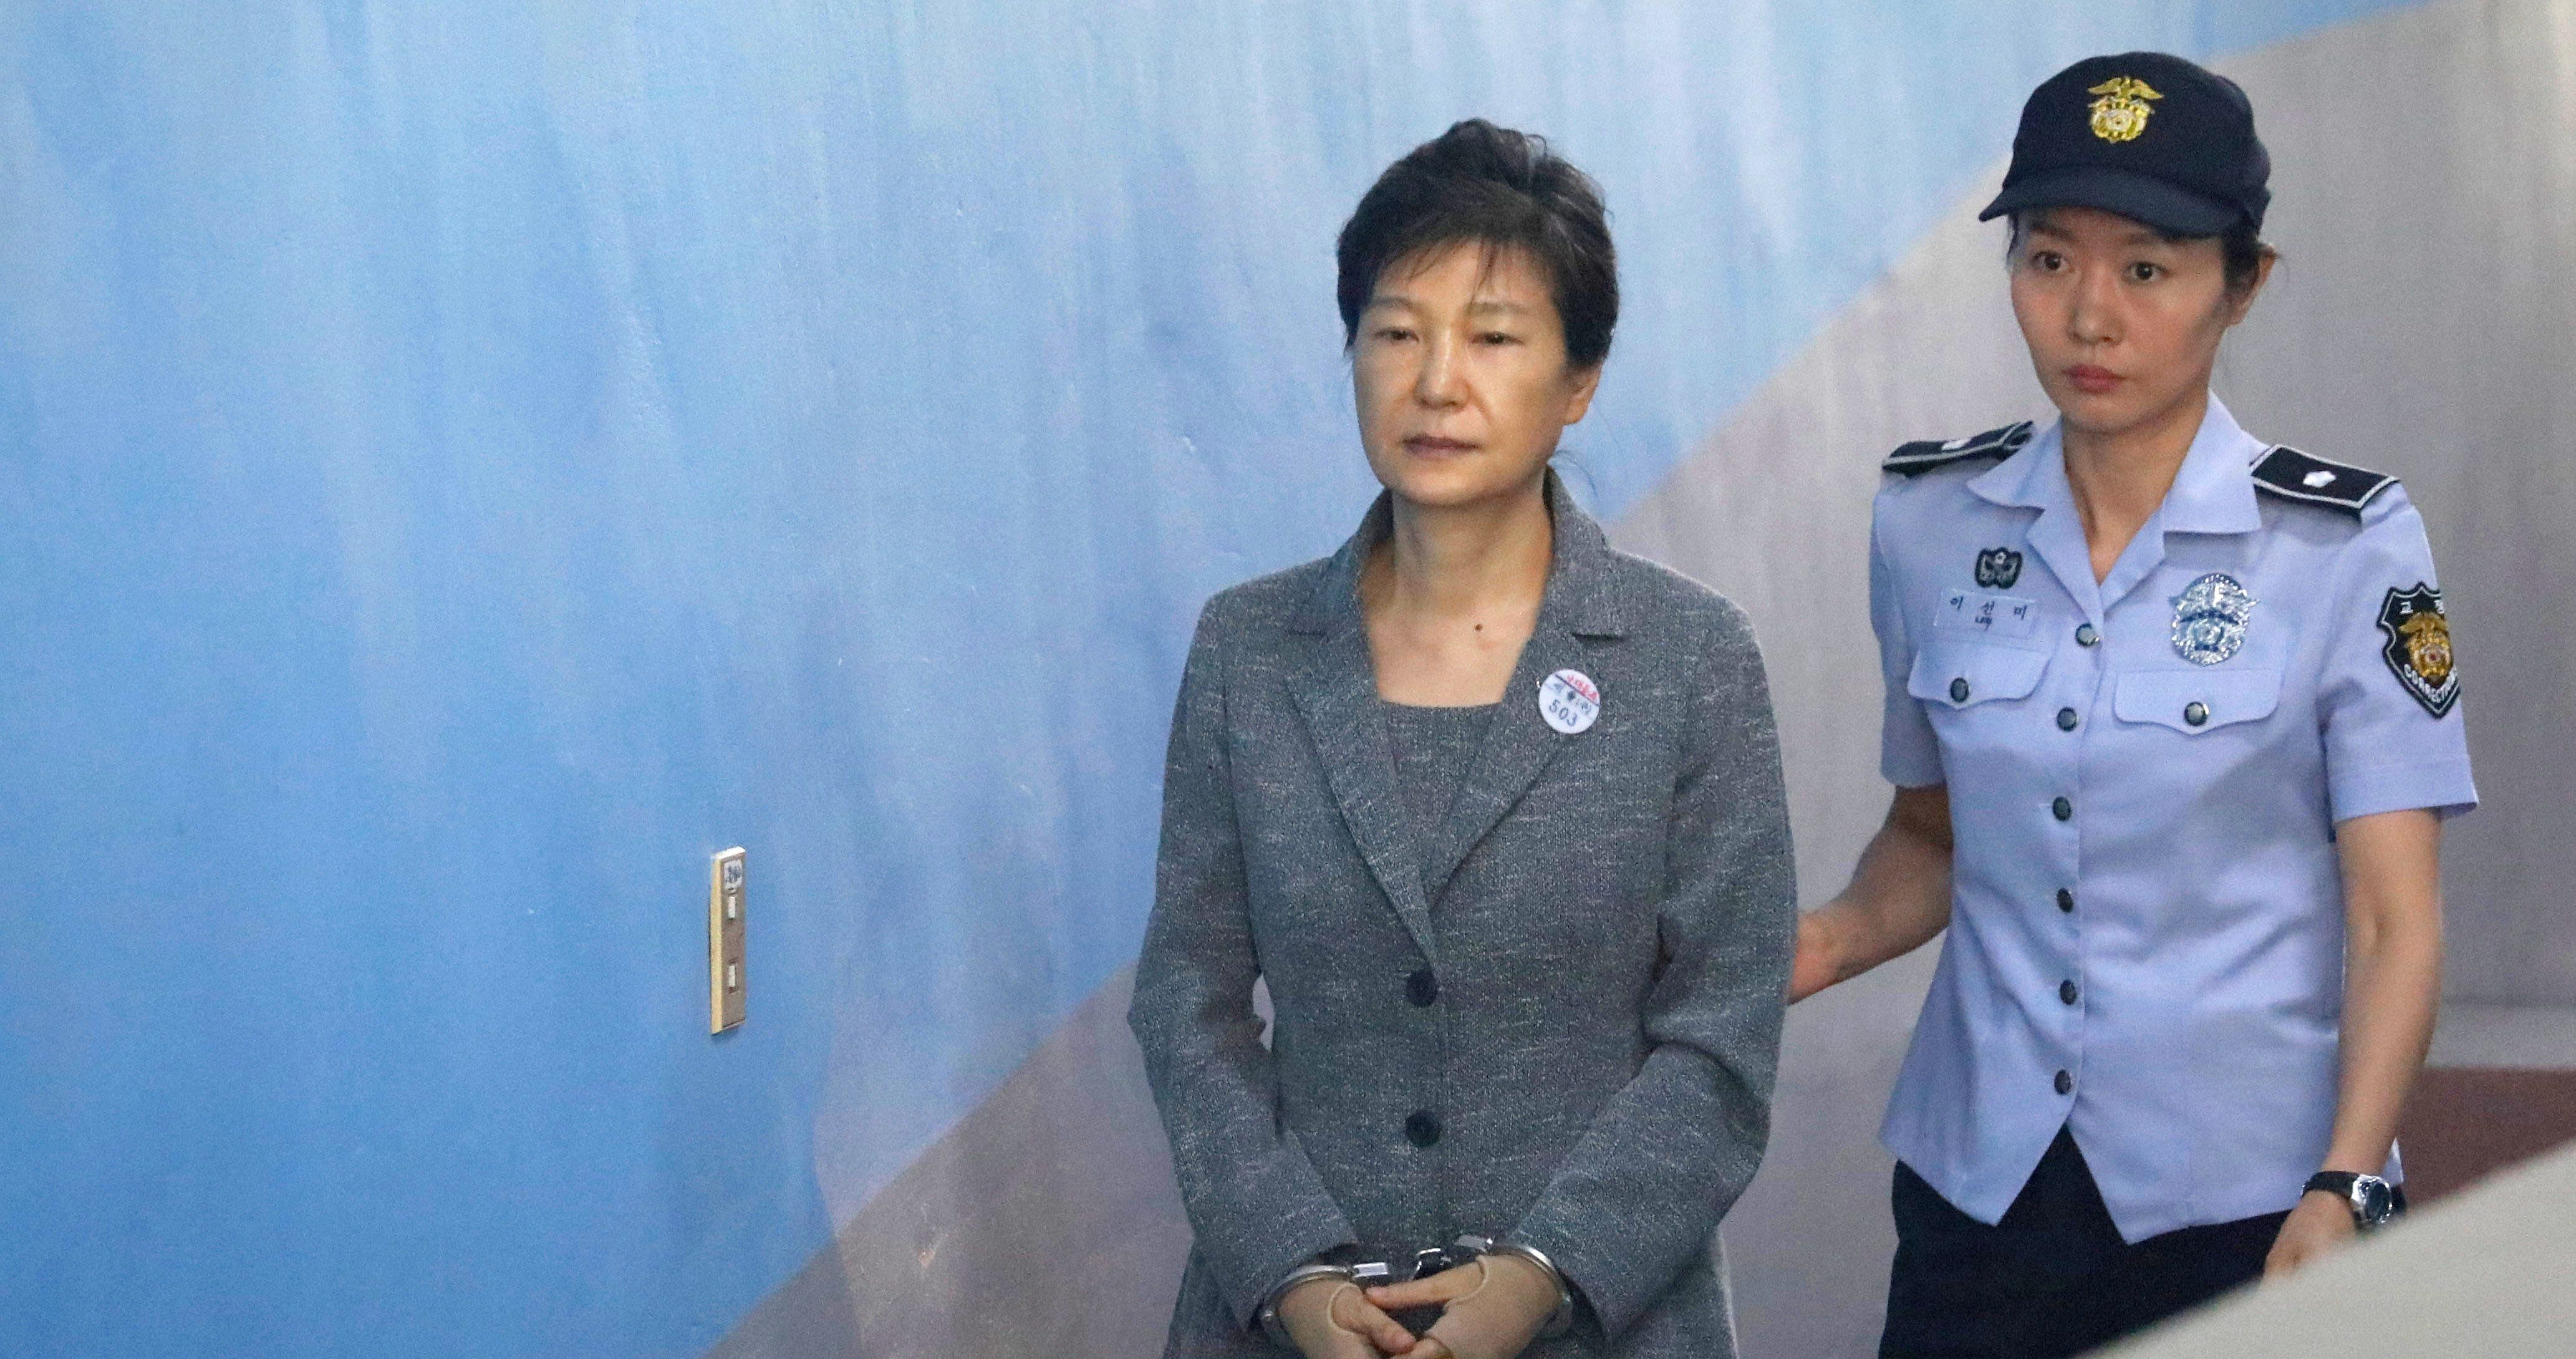 South Korean Former President Park Geun-hye on trial